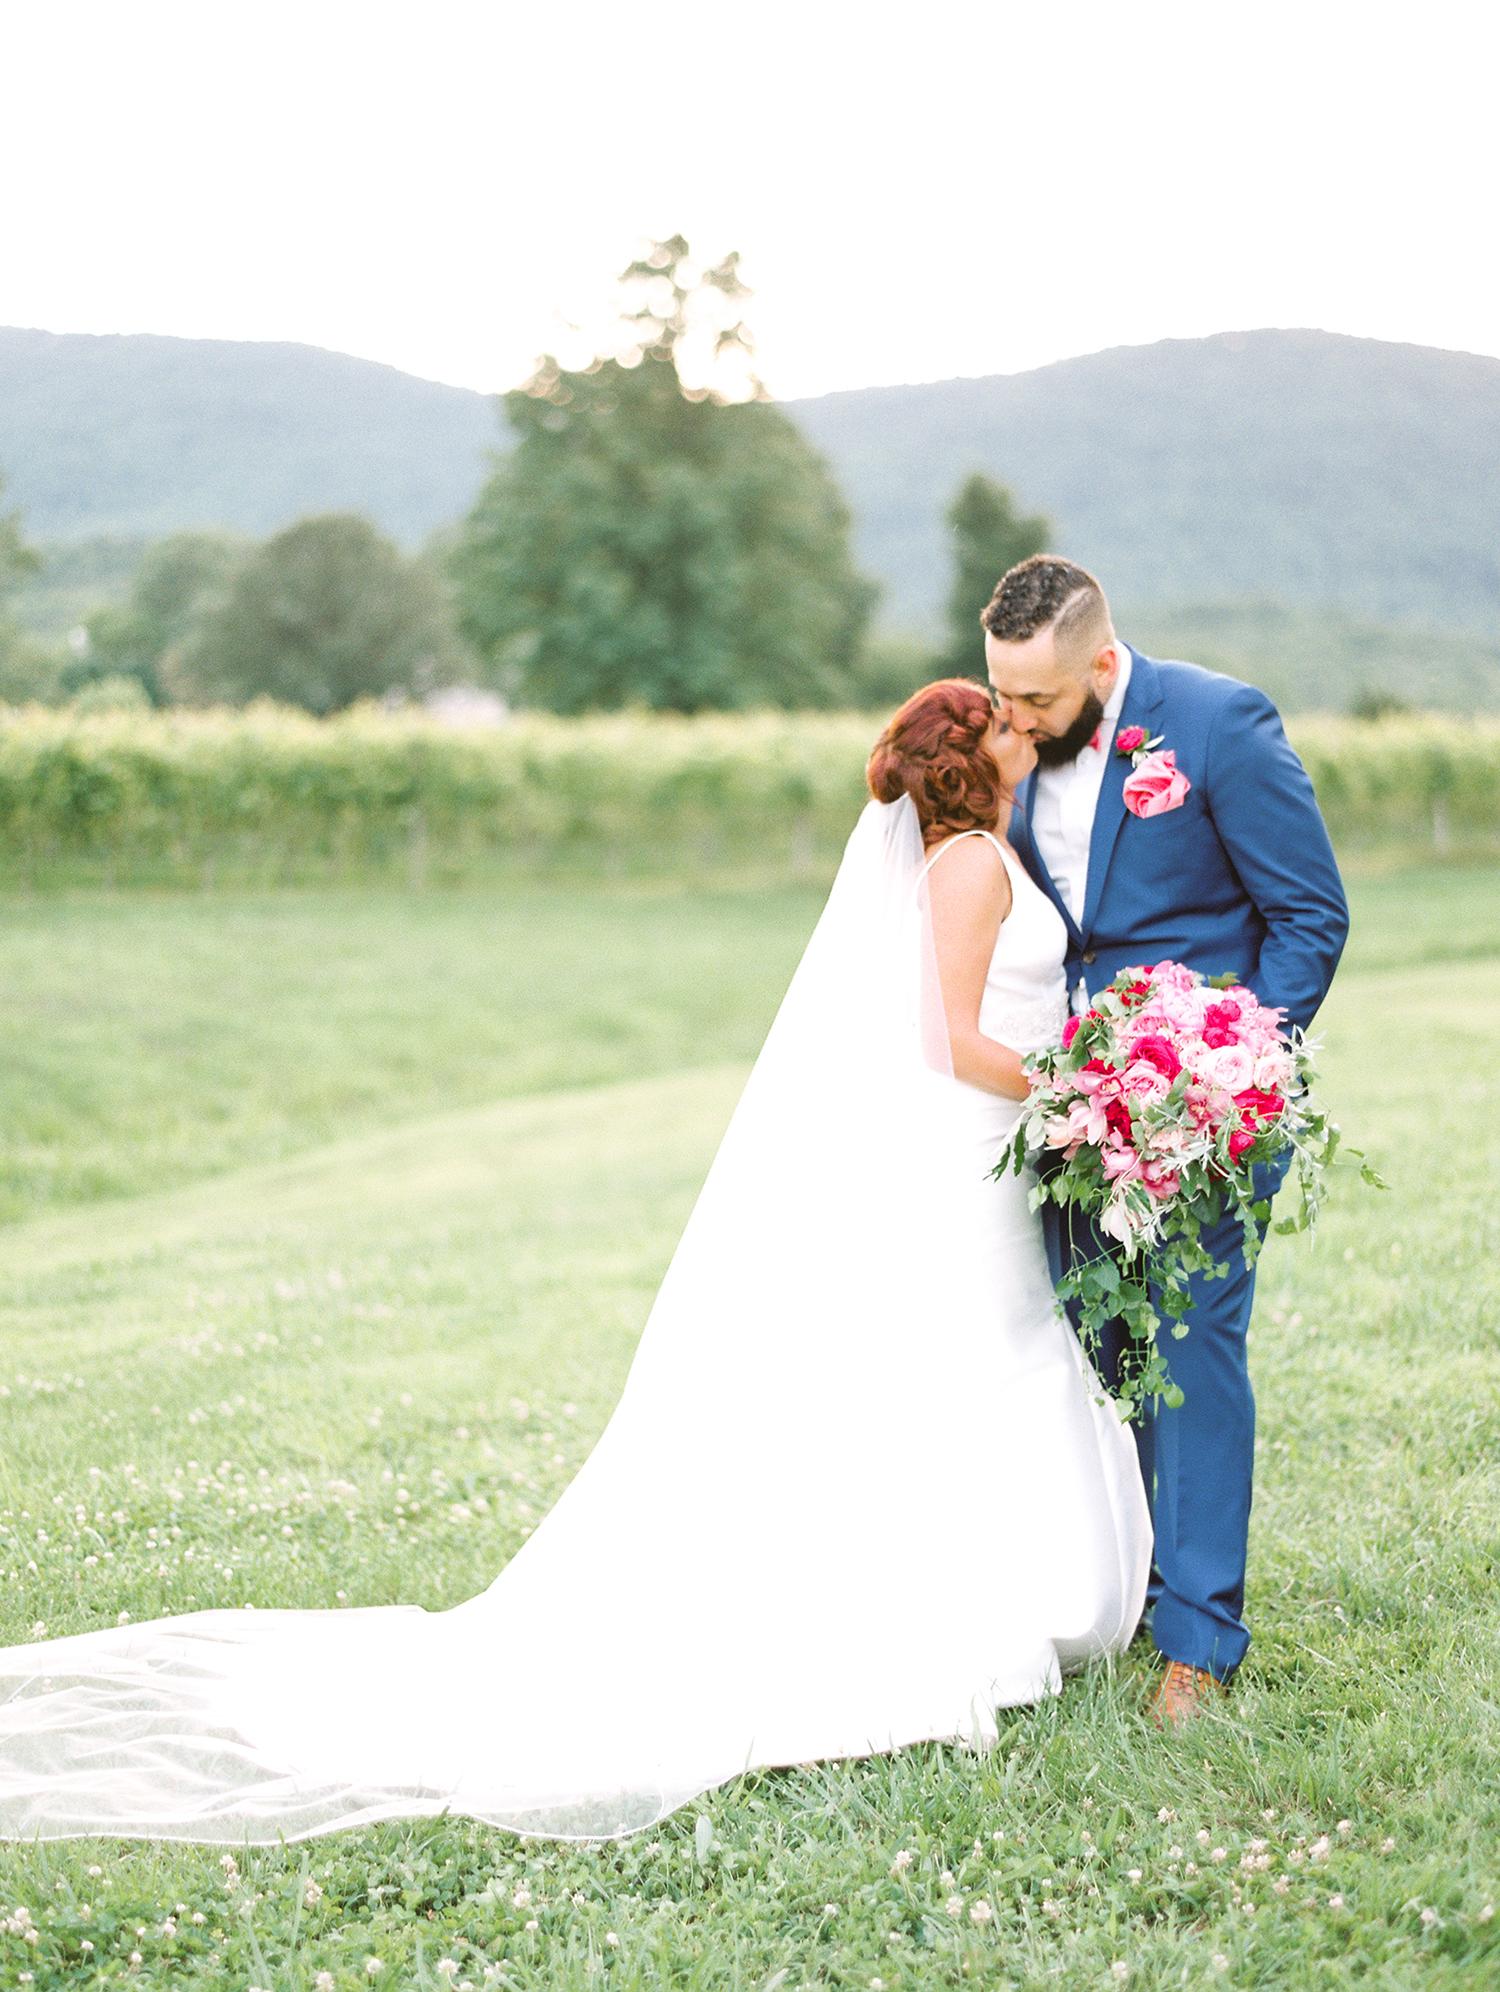 dawn rich wedding couple kissing in field